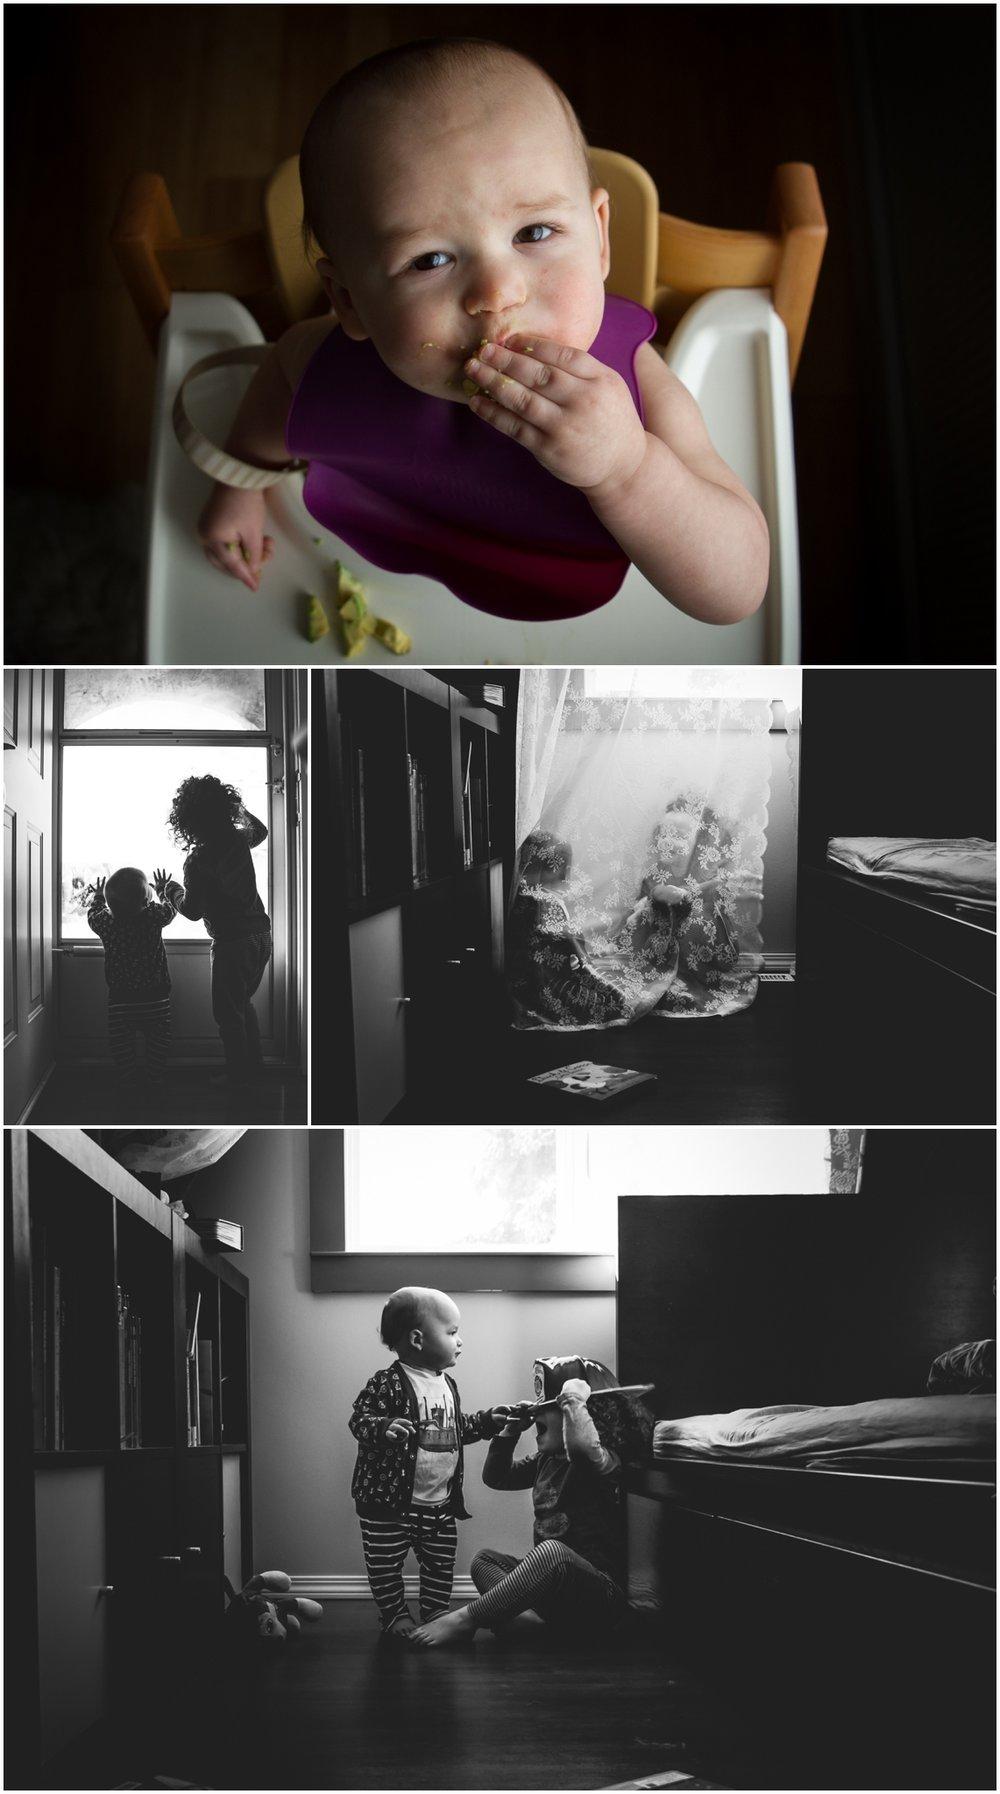 Edmonton Baby Child Photographer Lifestyle - Best of 2016  Documentary Photography